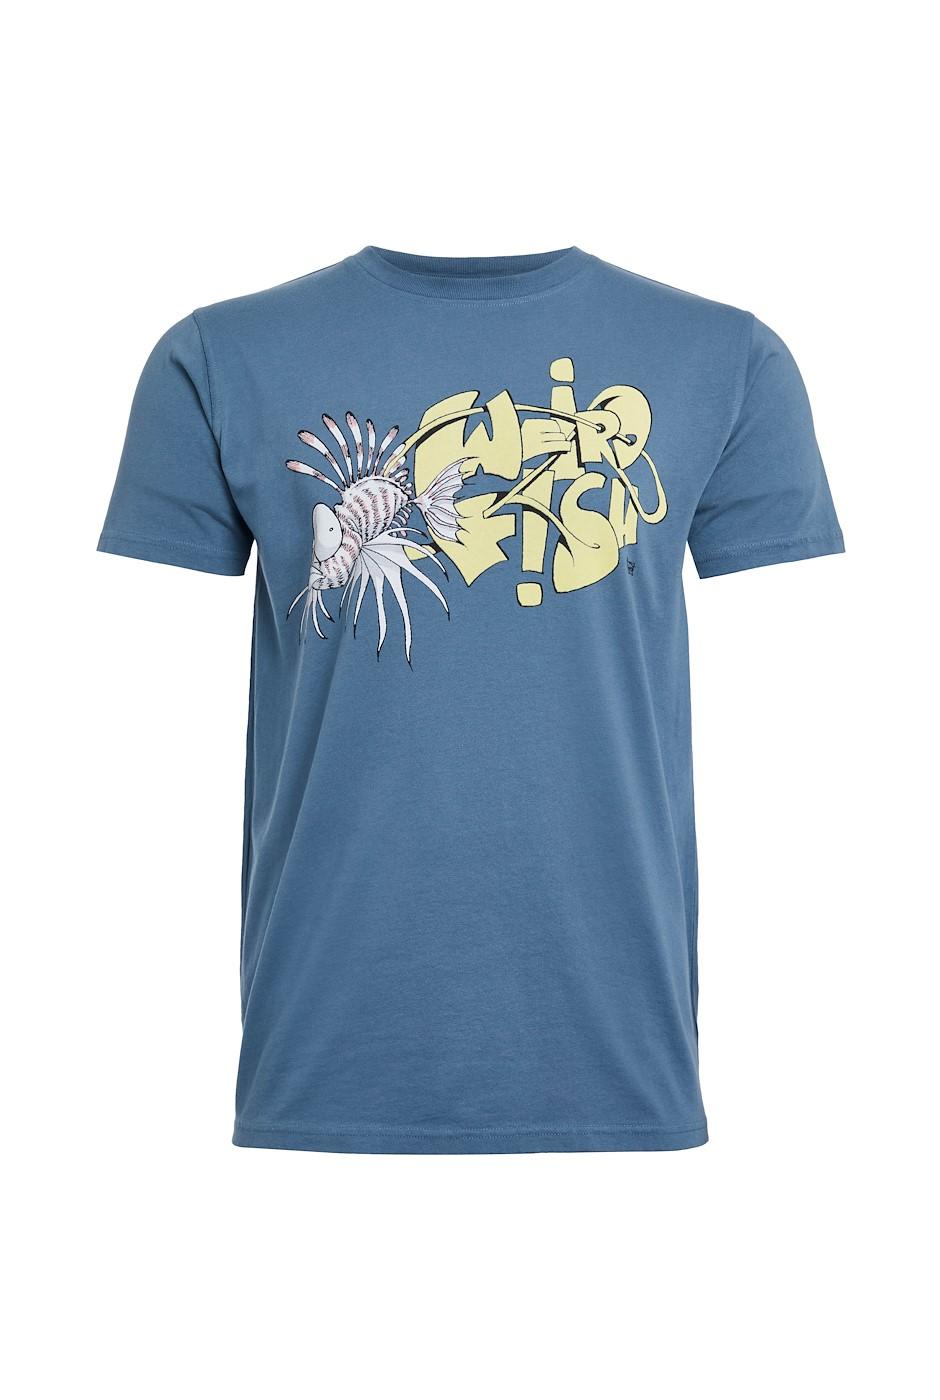 Scorpion Fish Organic Cotton Artist T-Shirt Blue Mirage